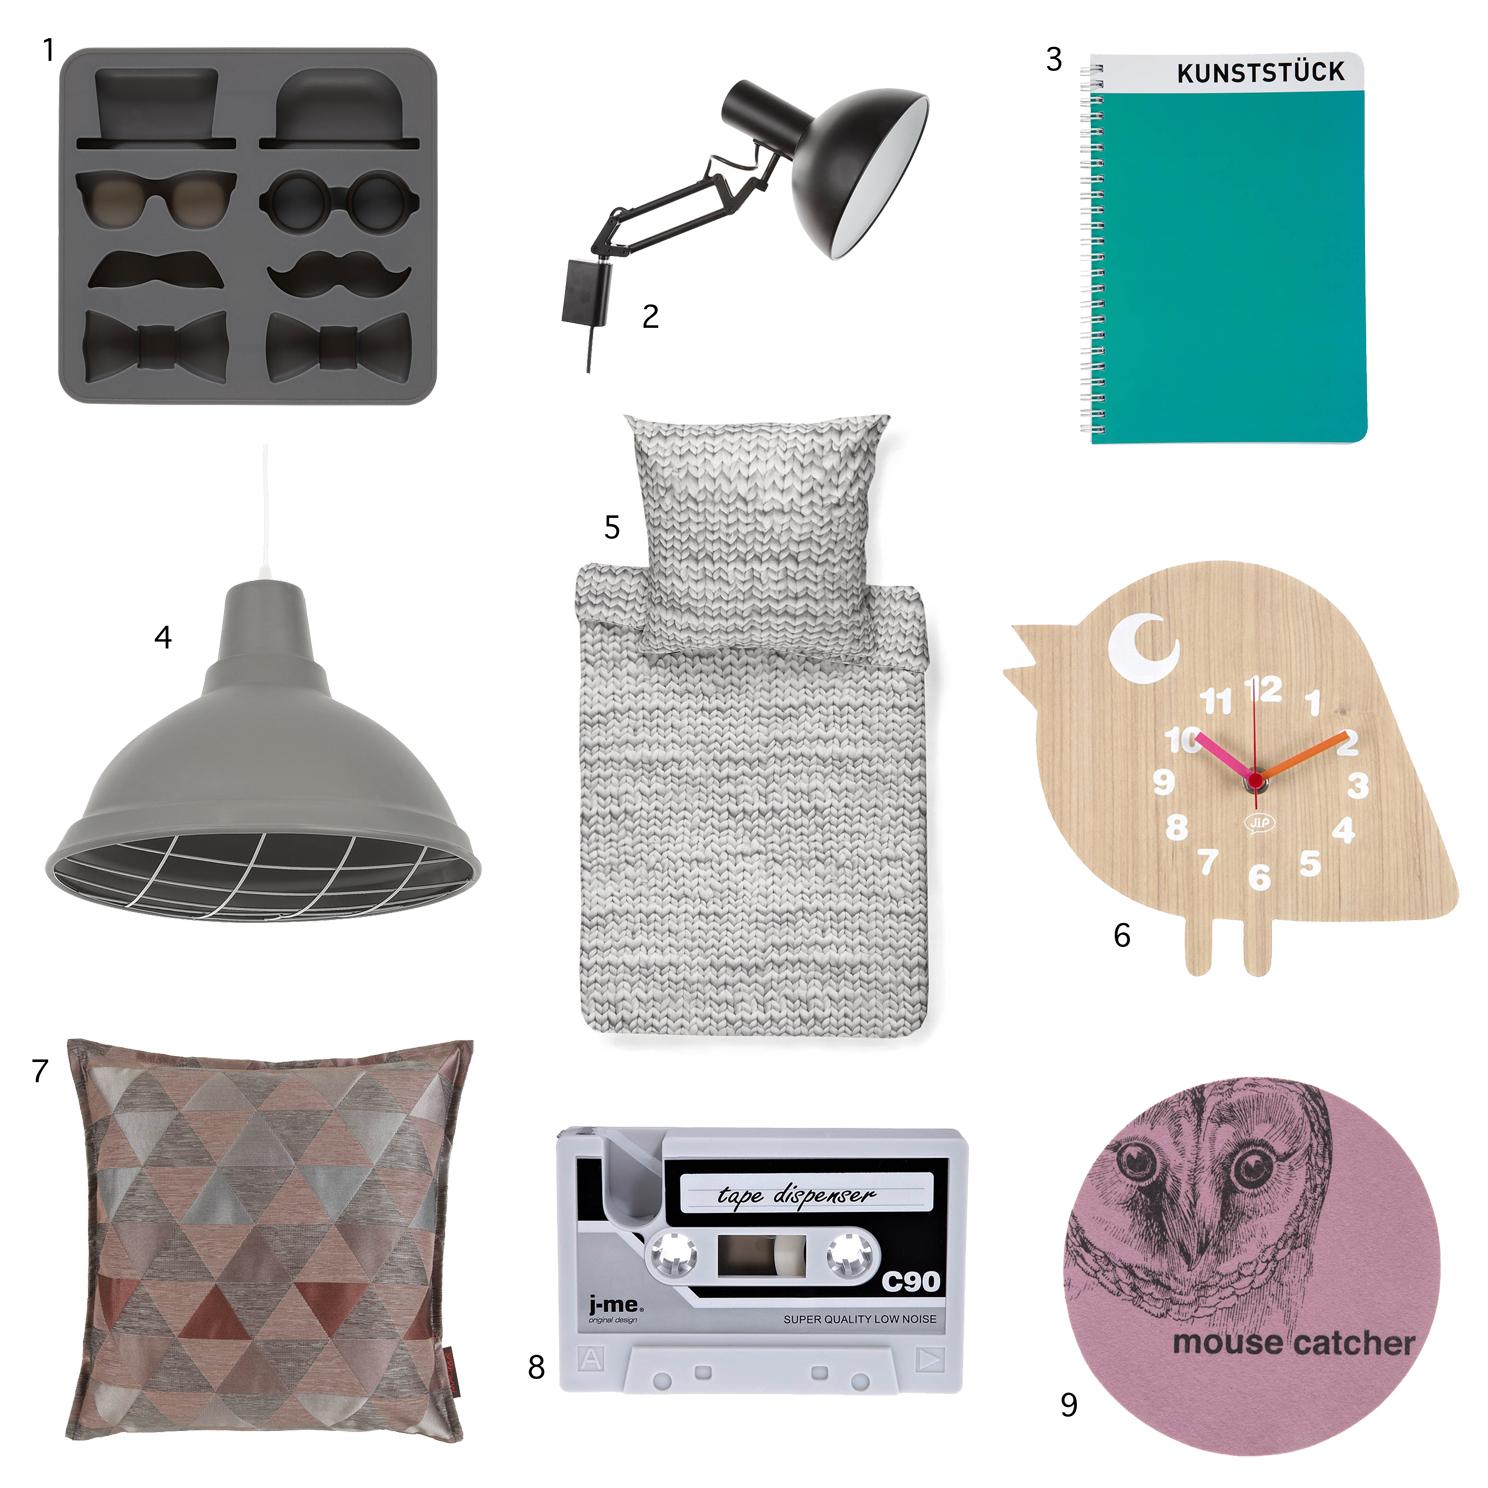 zalando-indretning-musemaatte-pude-tapedispenser-tapeholder-vaegur-trae-sengetoej-snurk